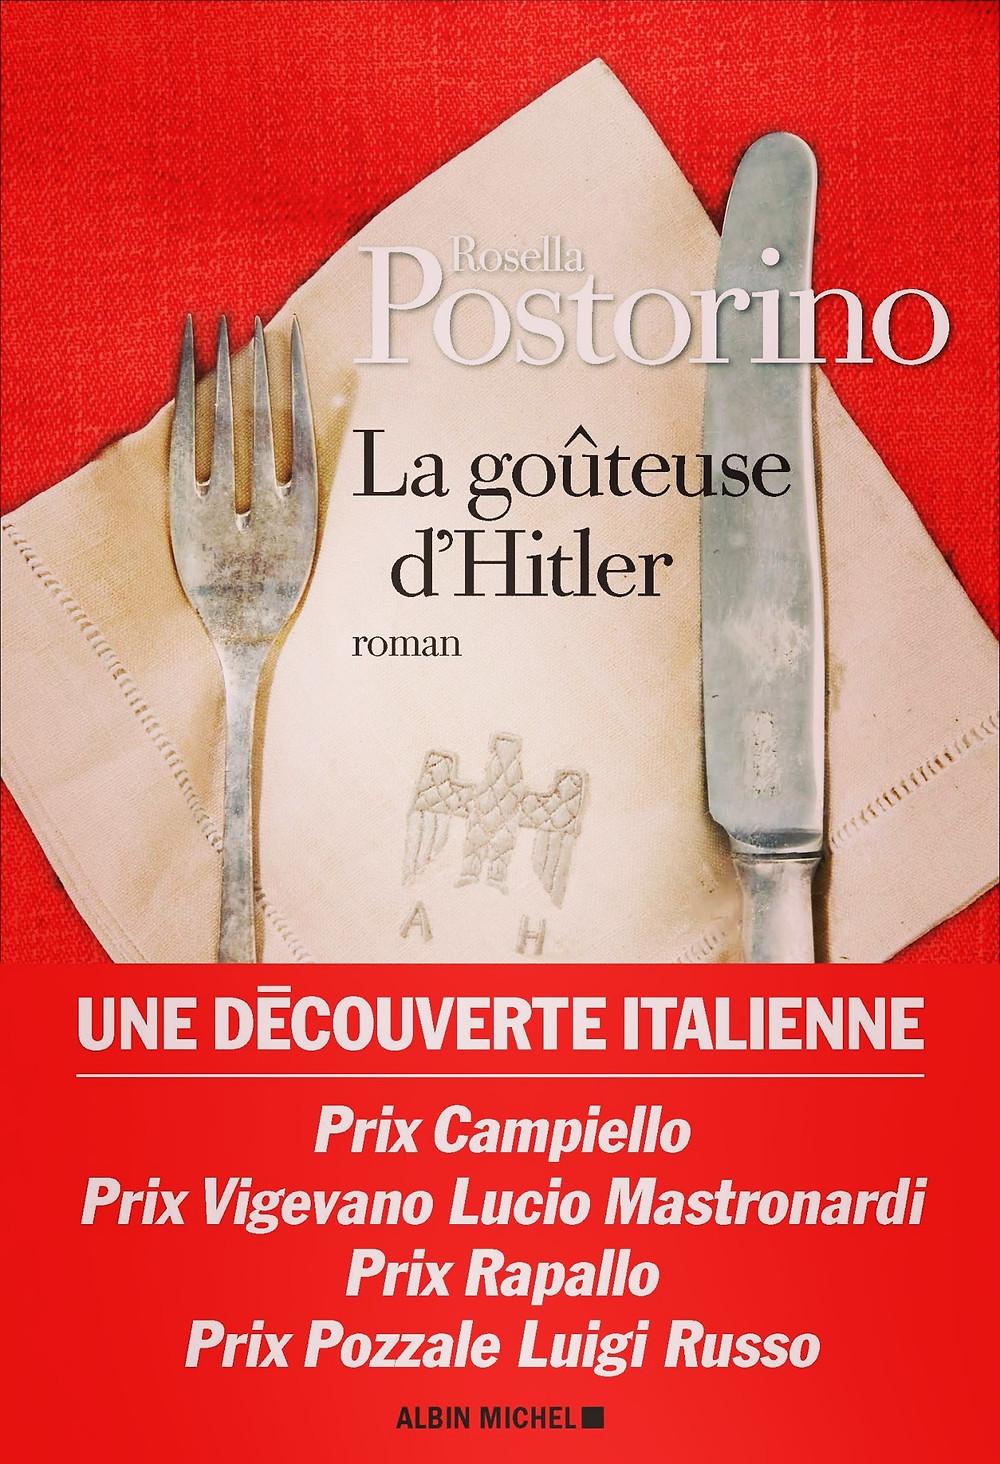 Roman «La goûteuse d'Hitler» de Rosella Postorino